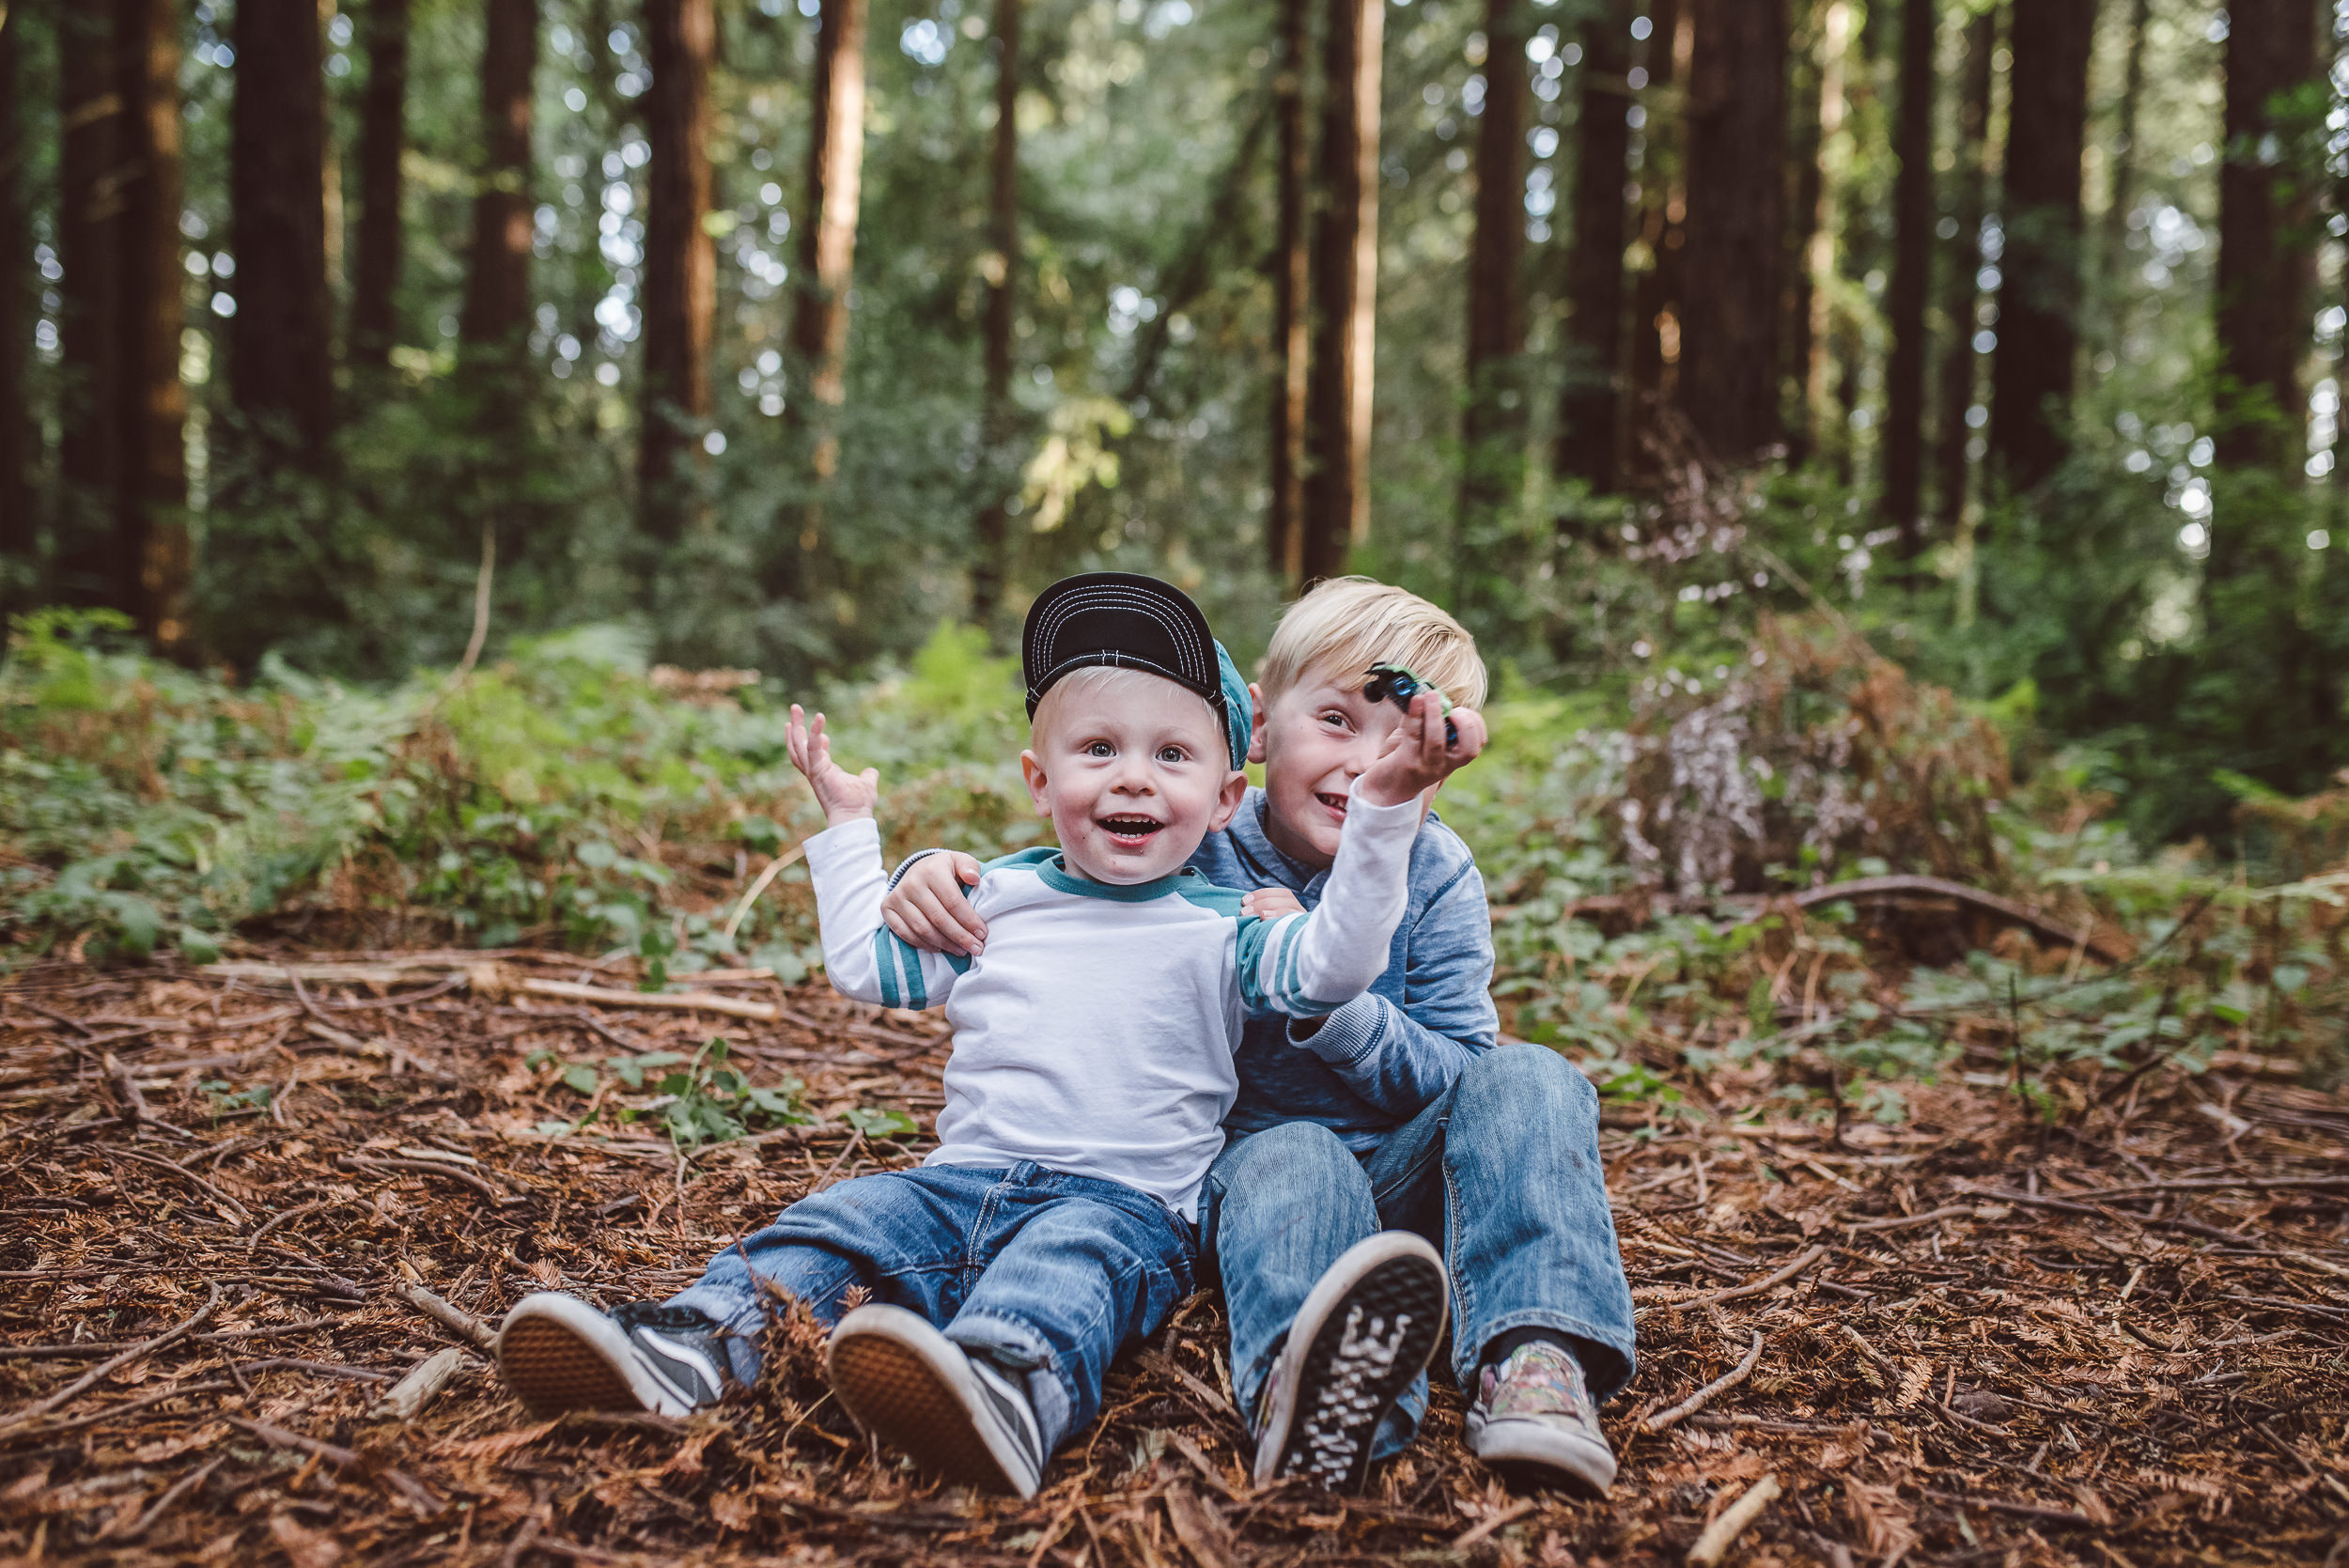 Joaquin-Miller-Park-Oakland-Family-Photography-029.jpg